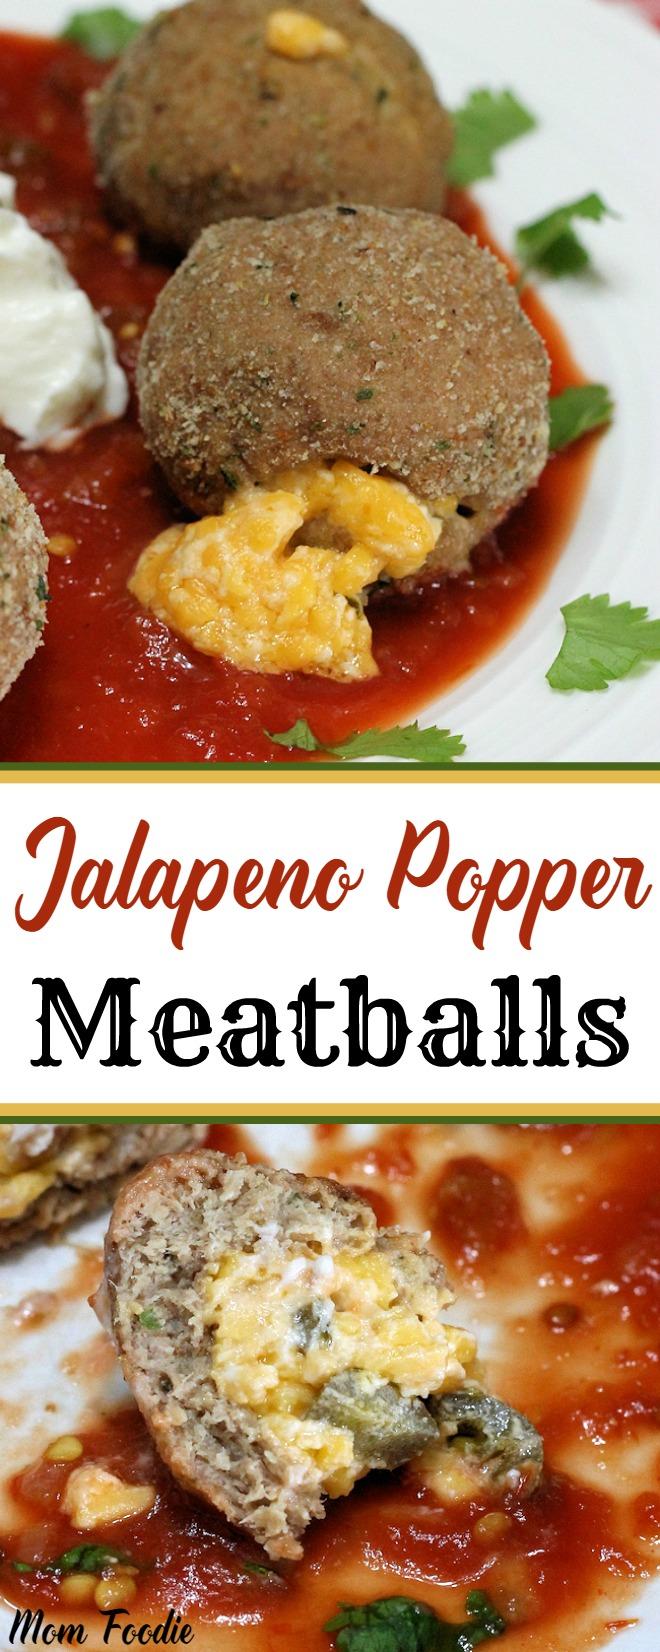 Jalapeno Popper Meatballs Recipe